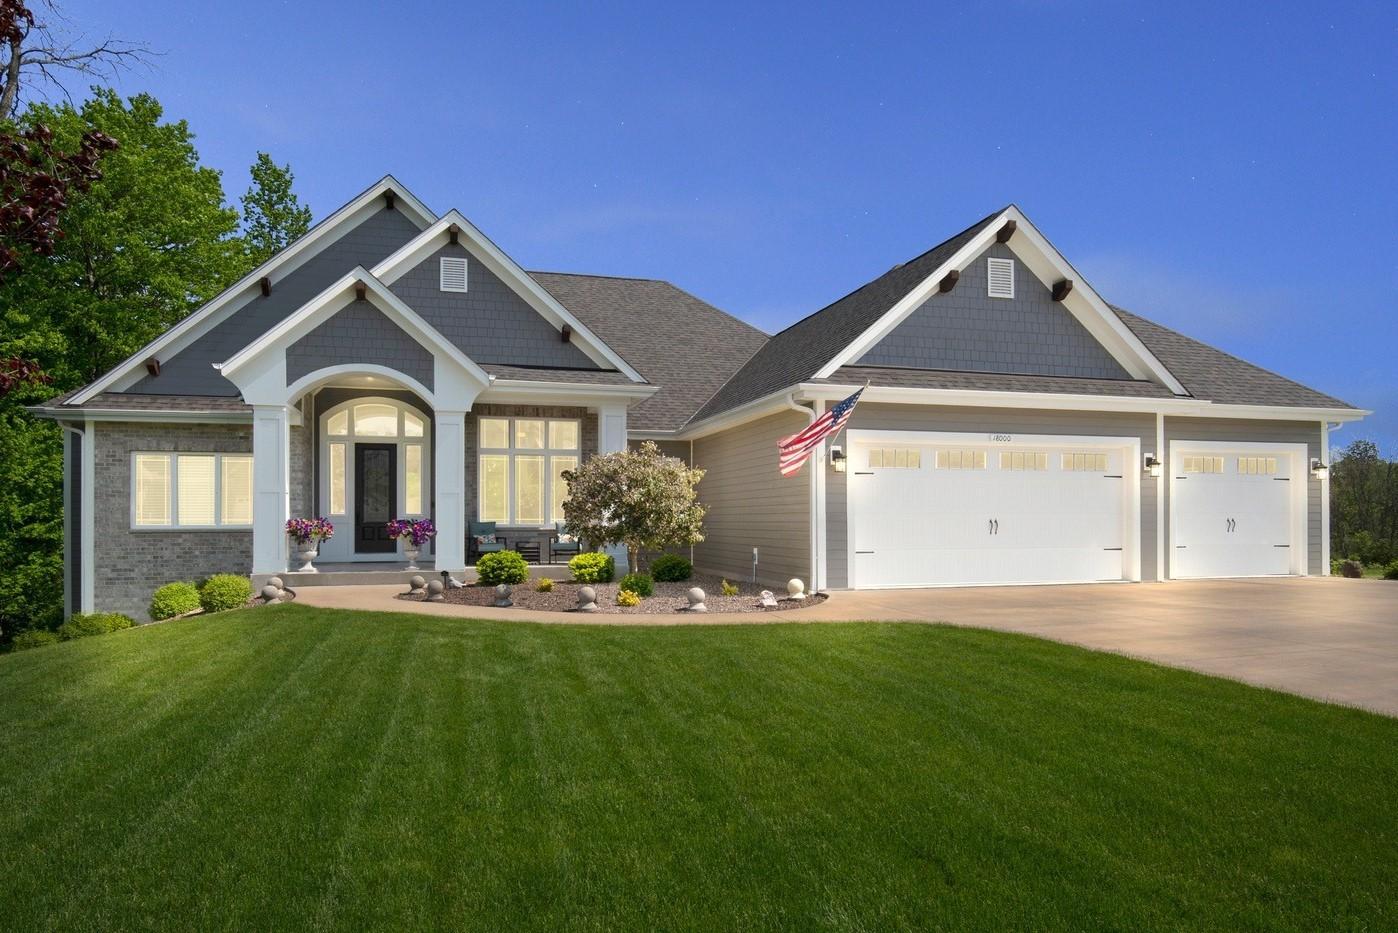 18000 Peregrine Ln, Brookfield, Wisconsin 53045, 5 Bedrooms Bedrooms, ,3 BathroomsBathrooms,Single-Family,For Sale,Peregrine Ln,1691073